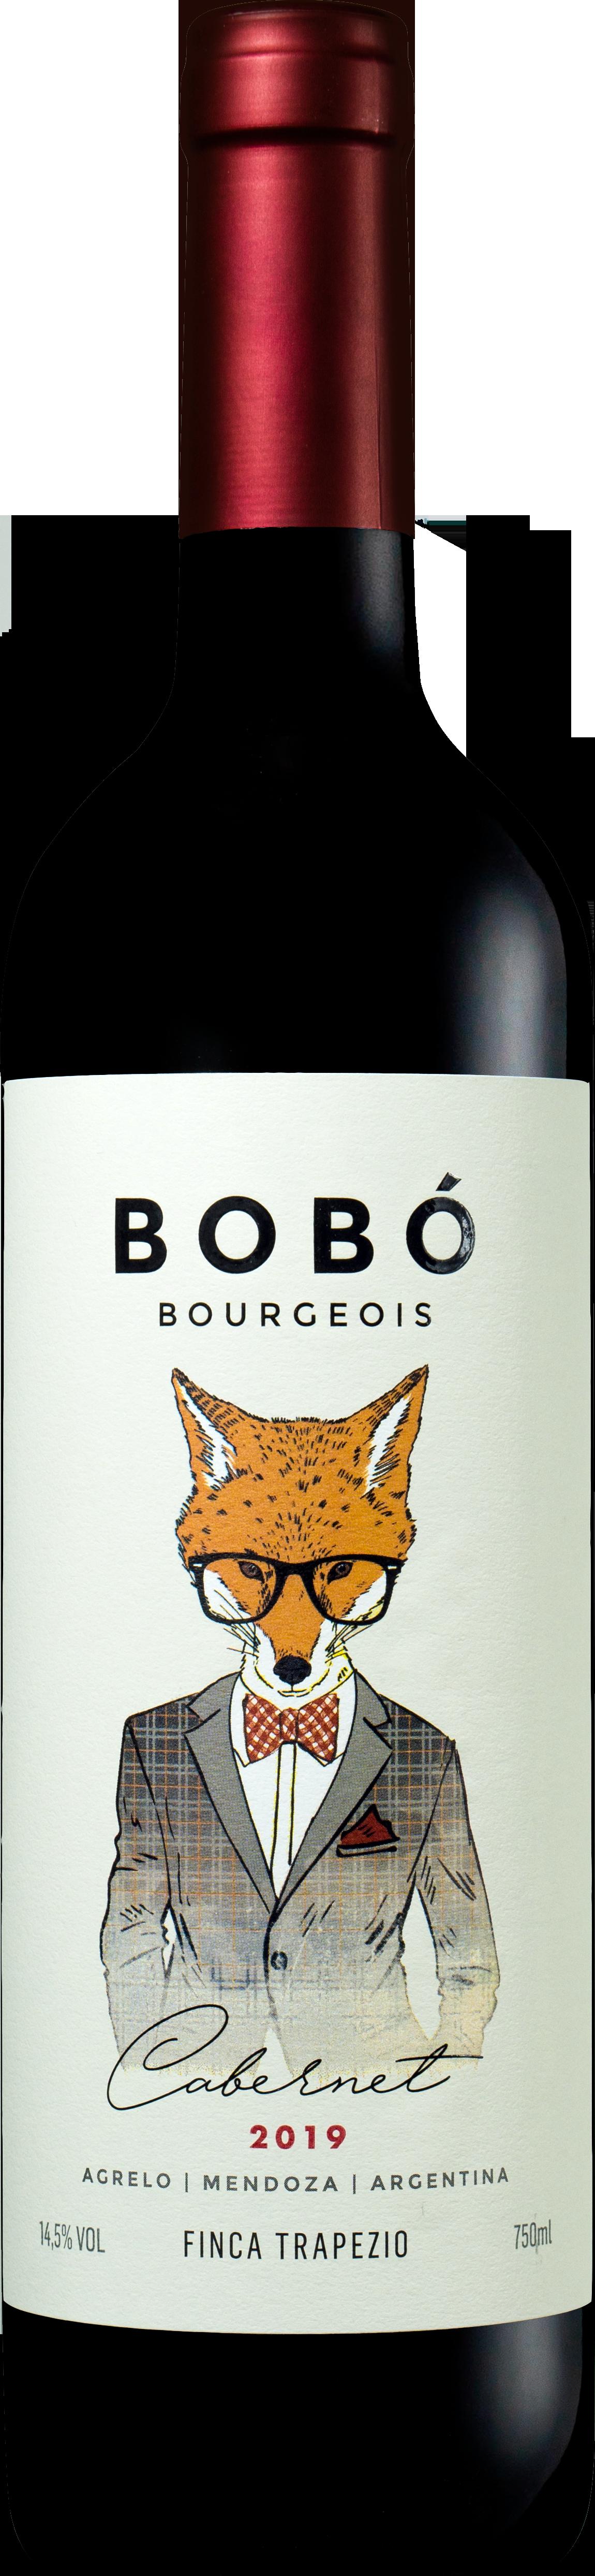 Bo Bó Bourgeois Cabernet Sauvignon